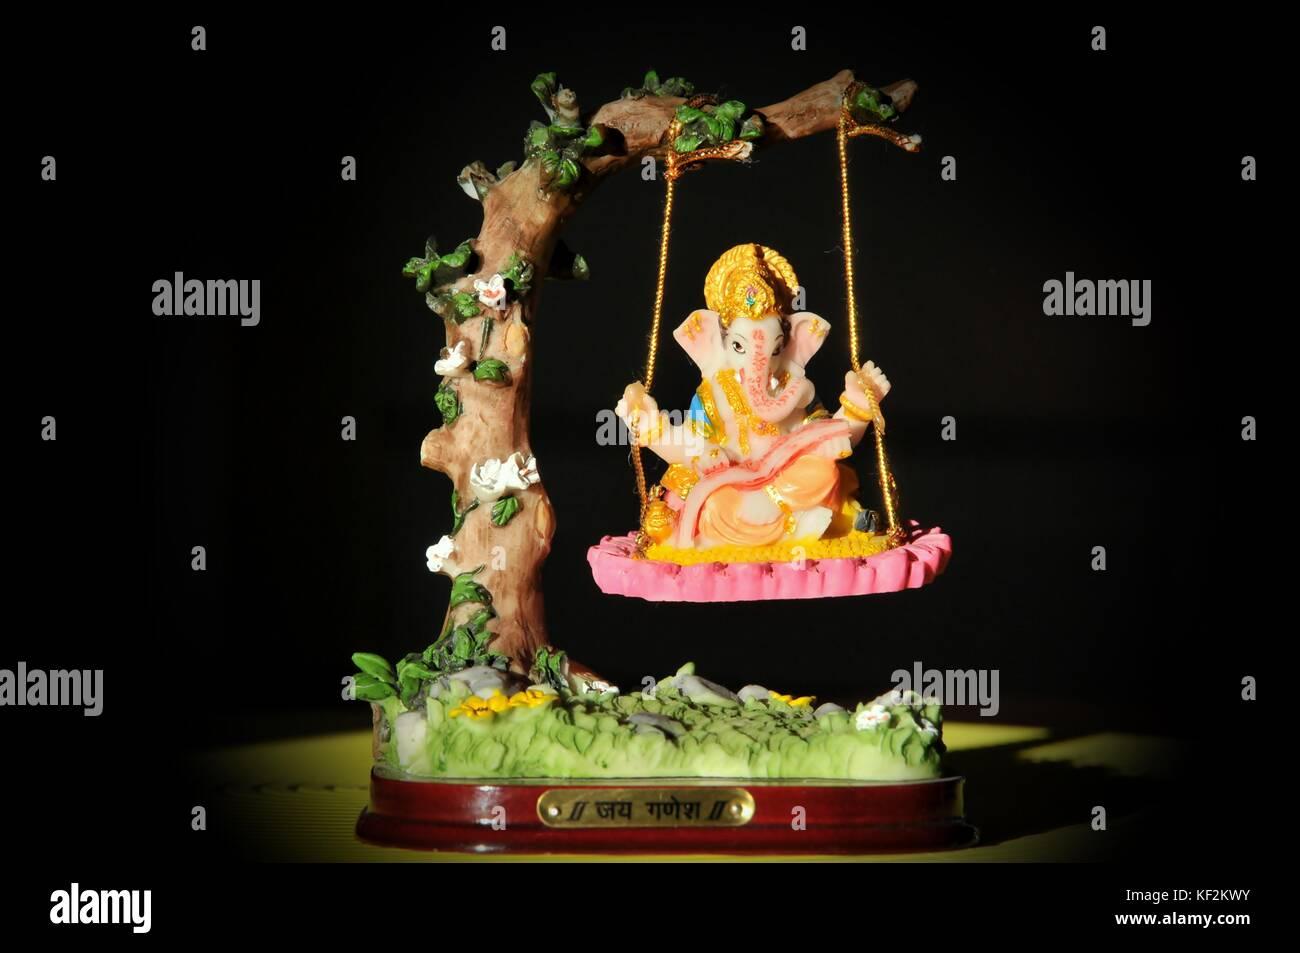 """Lord Ganesha"" Image of  Hindu god on a swing. Stock Photo"